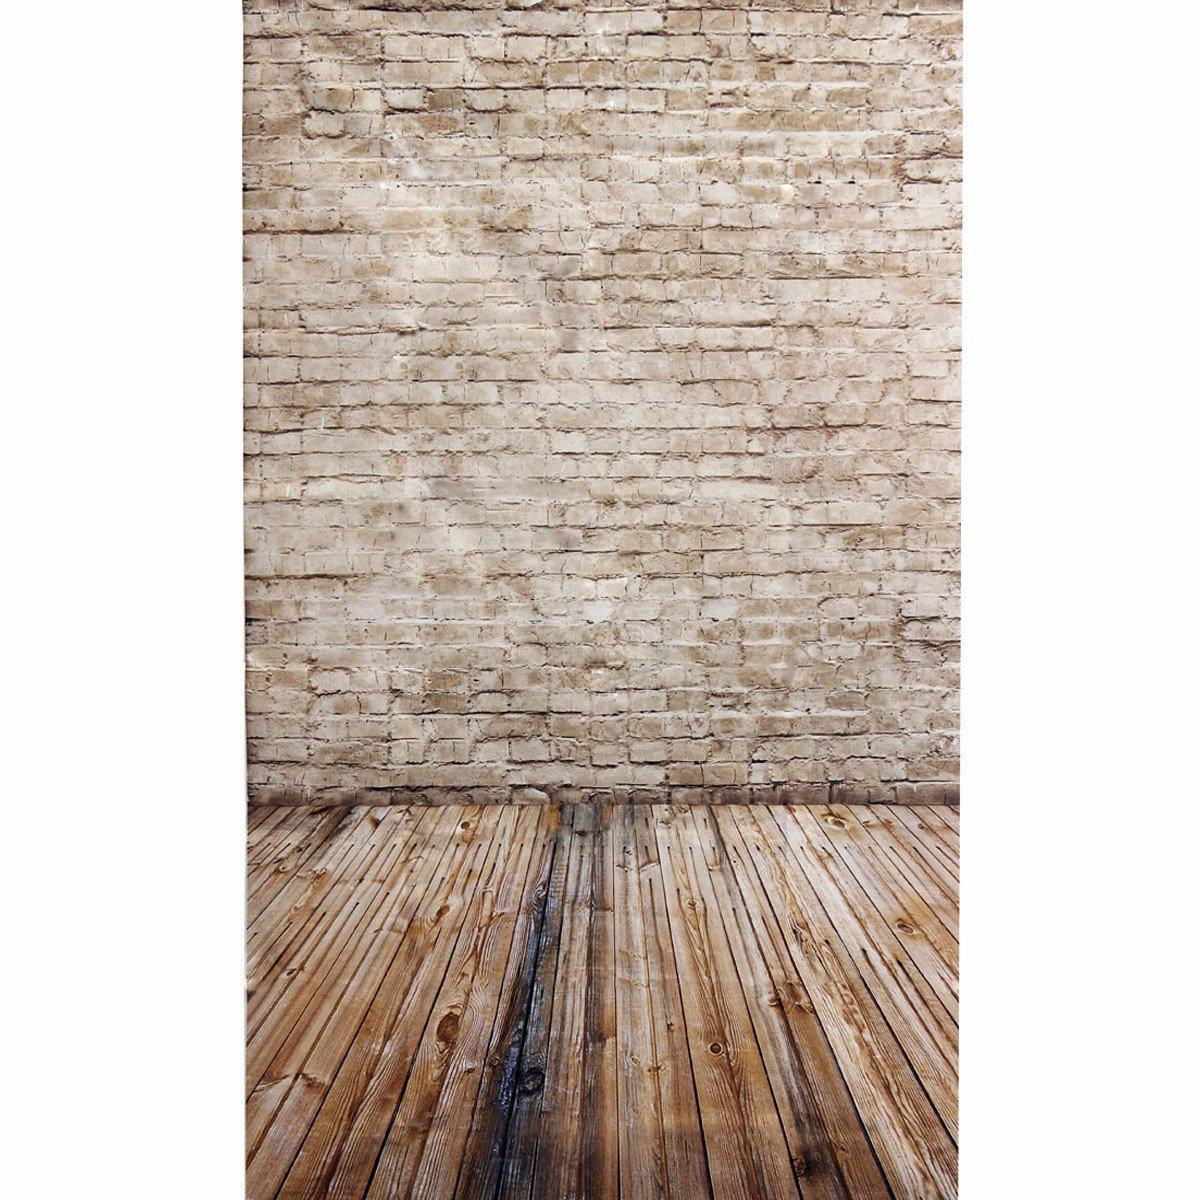 40 types vinyl wood wall floor photography studio props backdrops